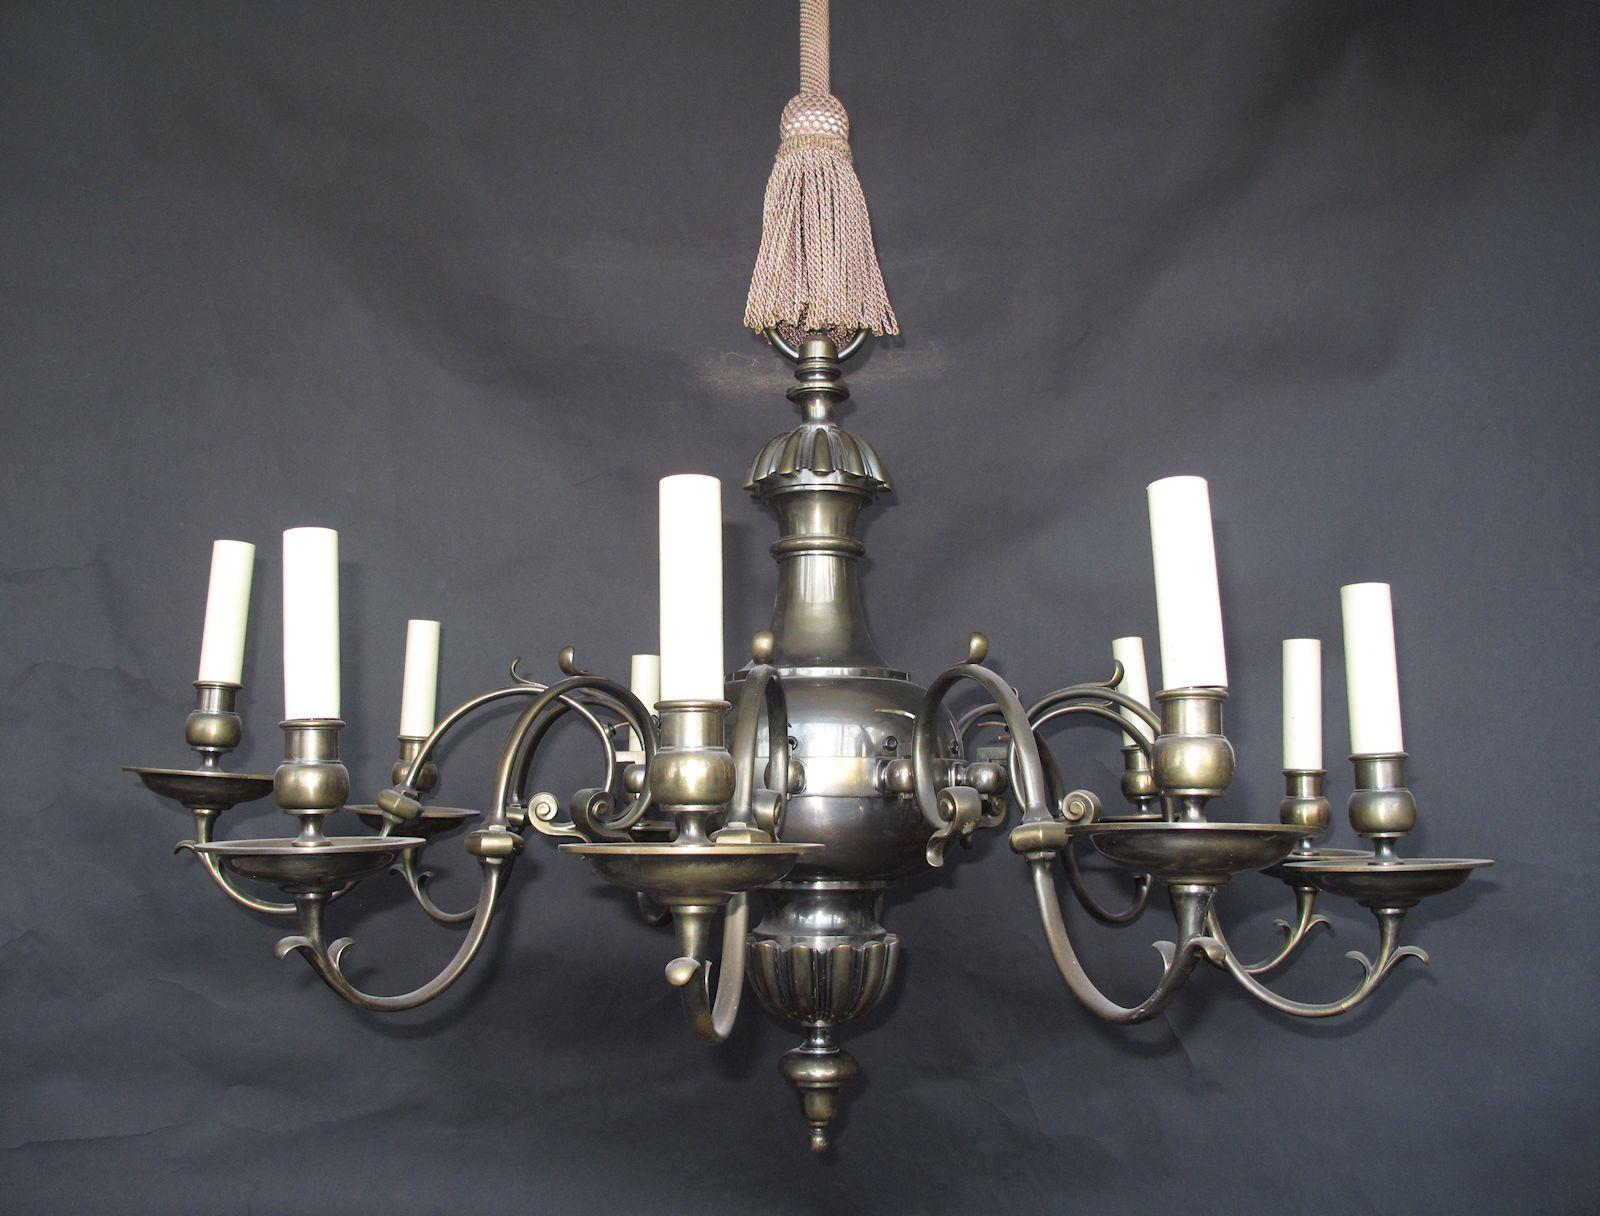 G p cohn antique chandeliers repairs restoration 10 arm georgian style english brass chandelier ca 1920 arubaitofo Gallery